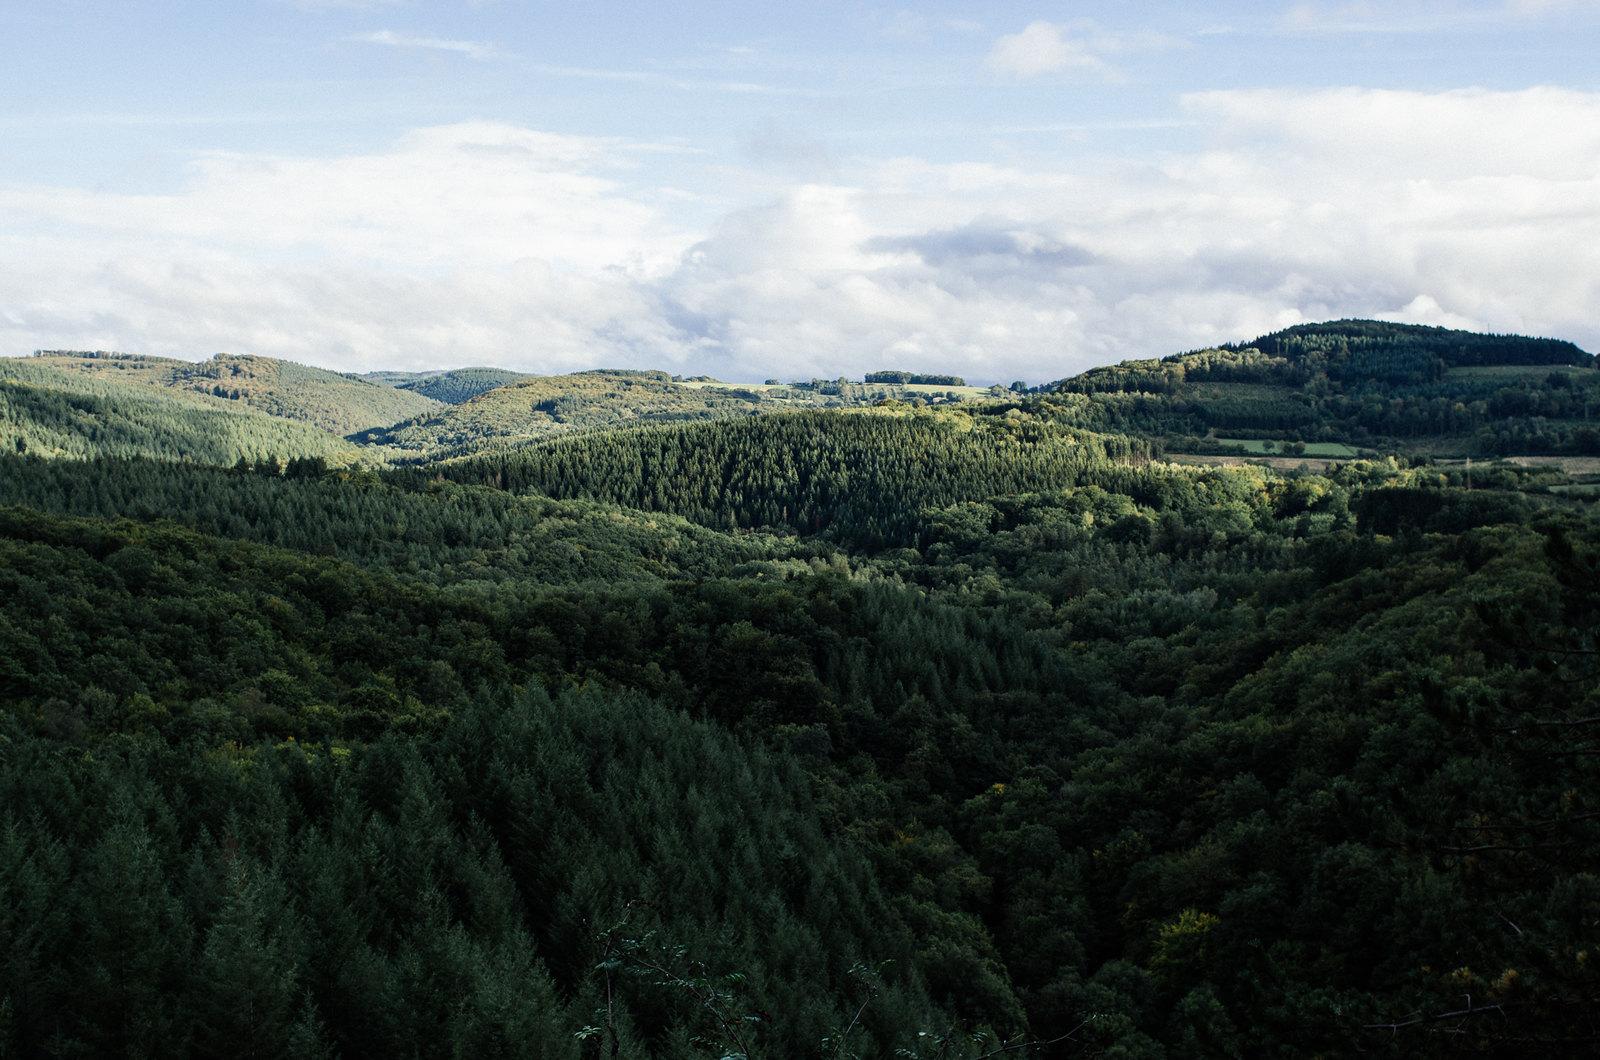 Grande randonnée en France - La grande traversée du Morvan